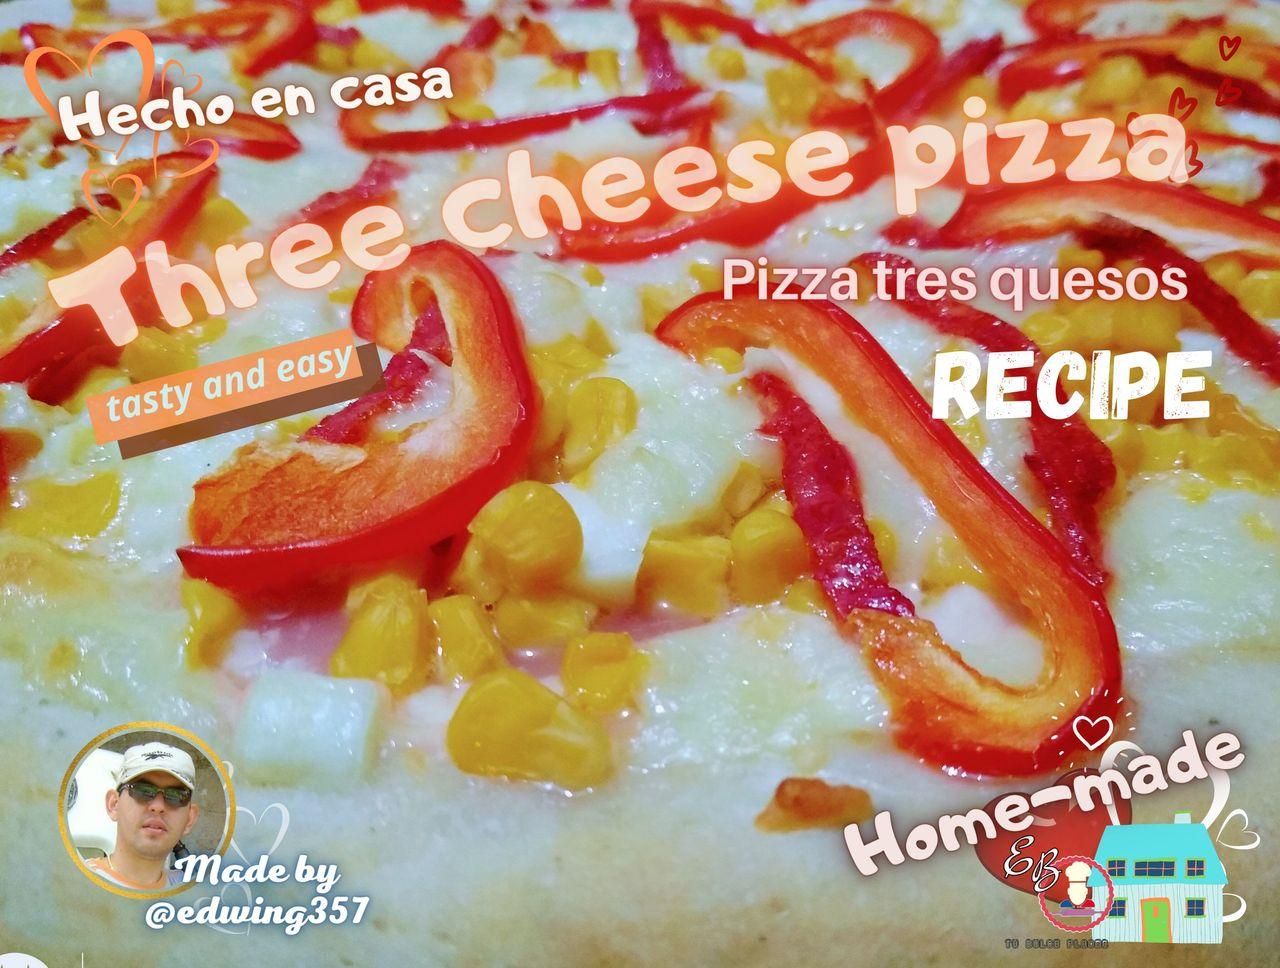 pizza tres quesos edwing357.png